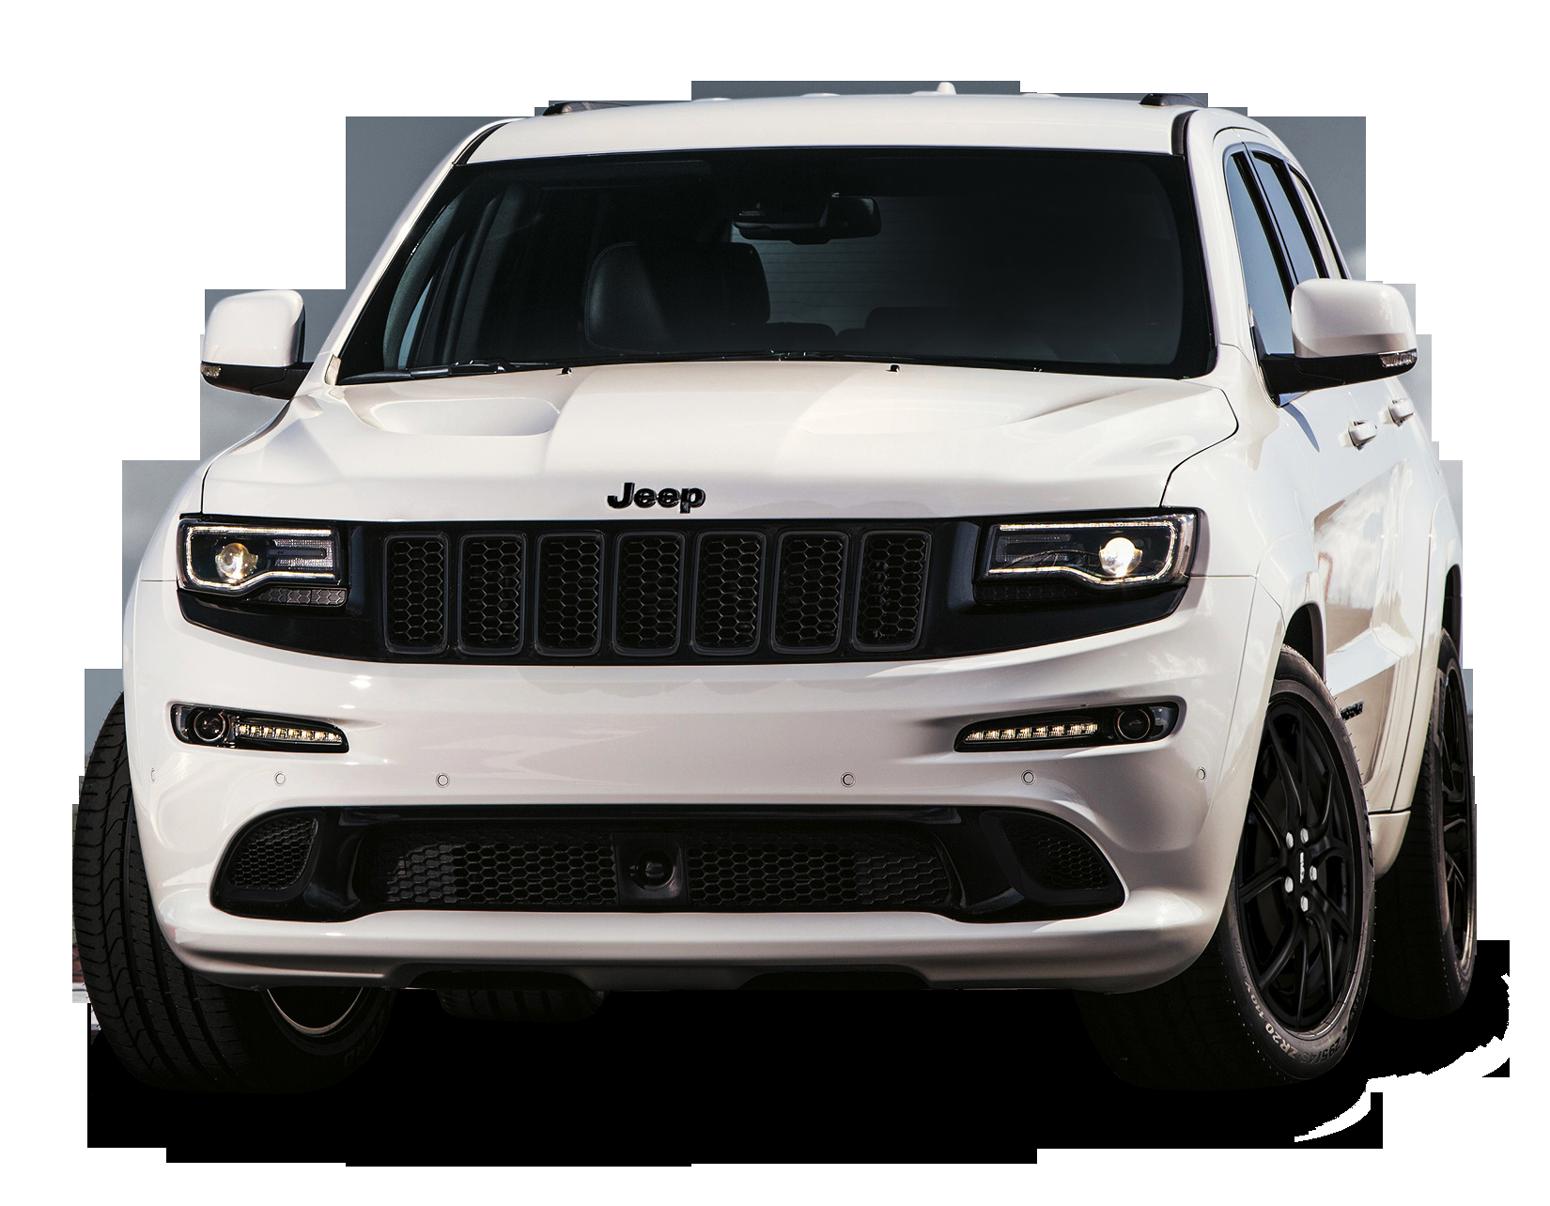 Jeep Grand Cherokee SRT White Car PNG Image - Car HD PNG - PNG HD Of Car